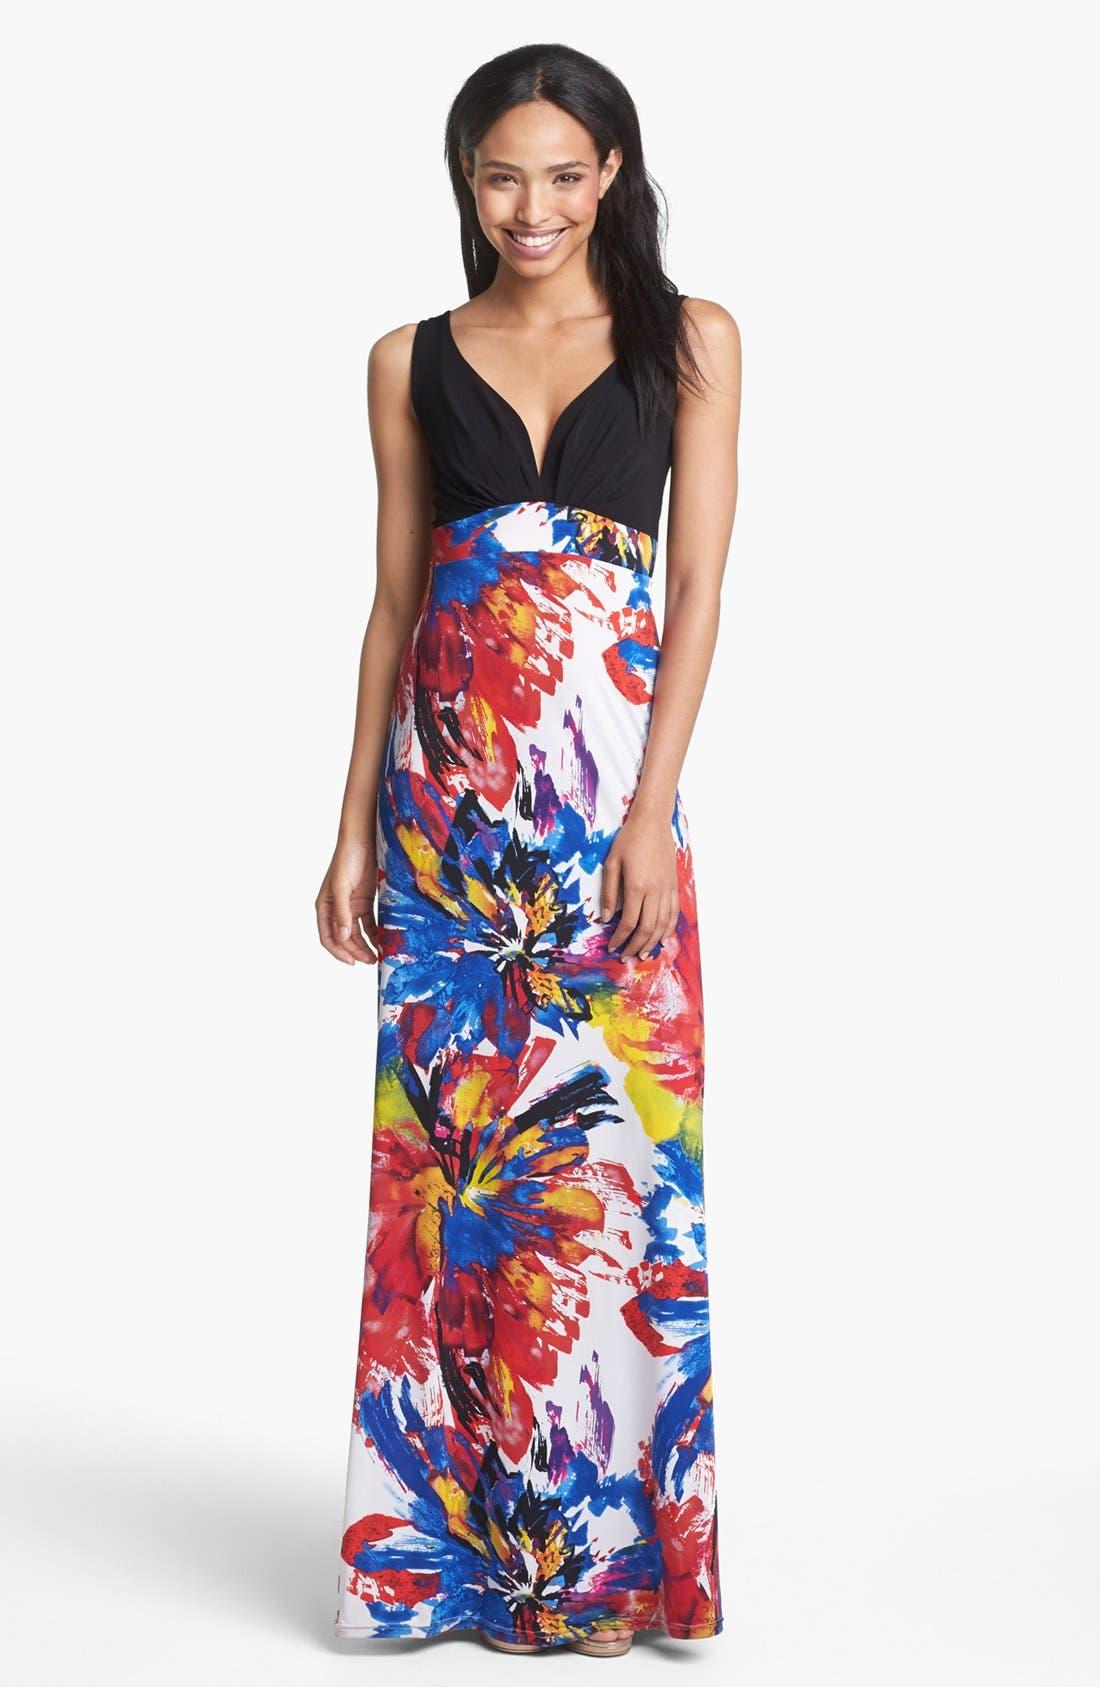 Alternate Image 1 Selected - Abi Ferrin 'India' Print Sleeveless Maxi Dress